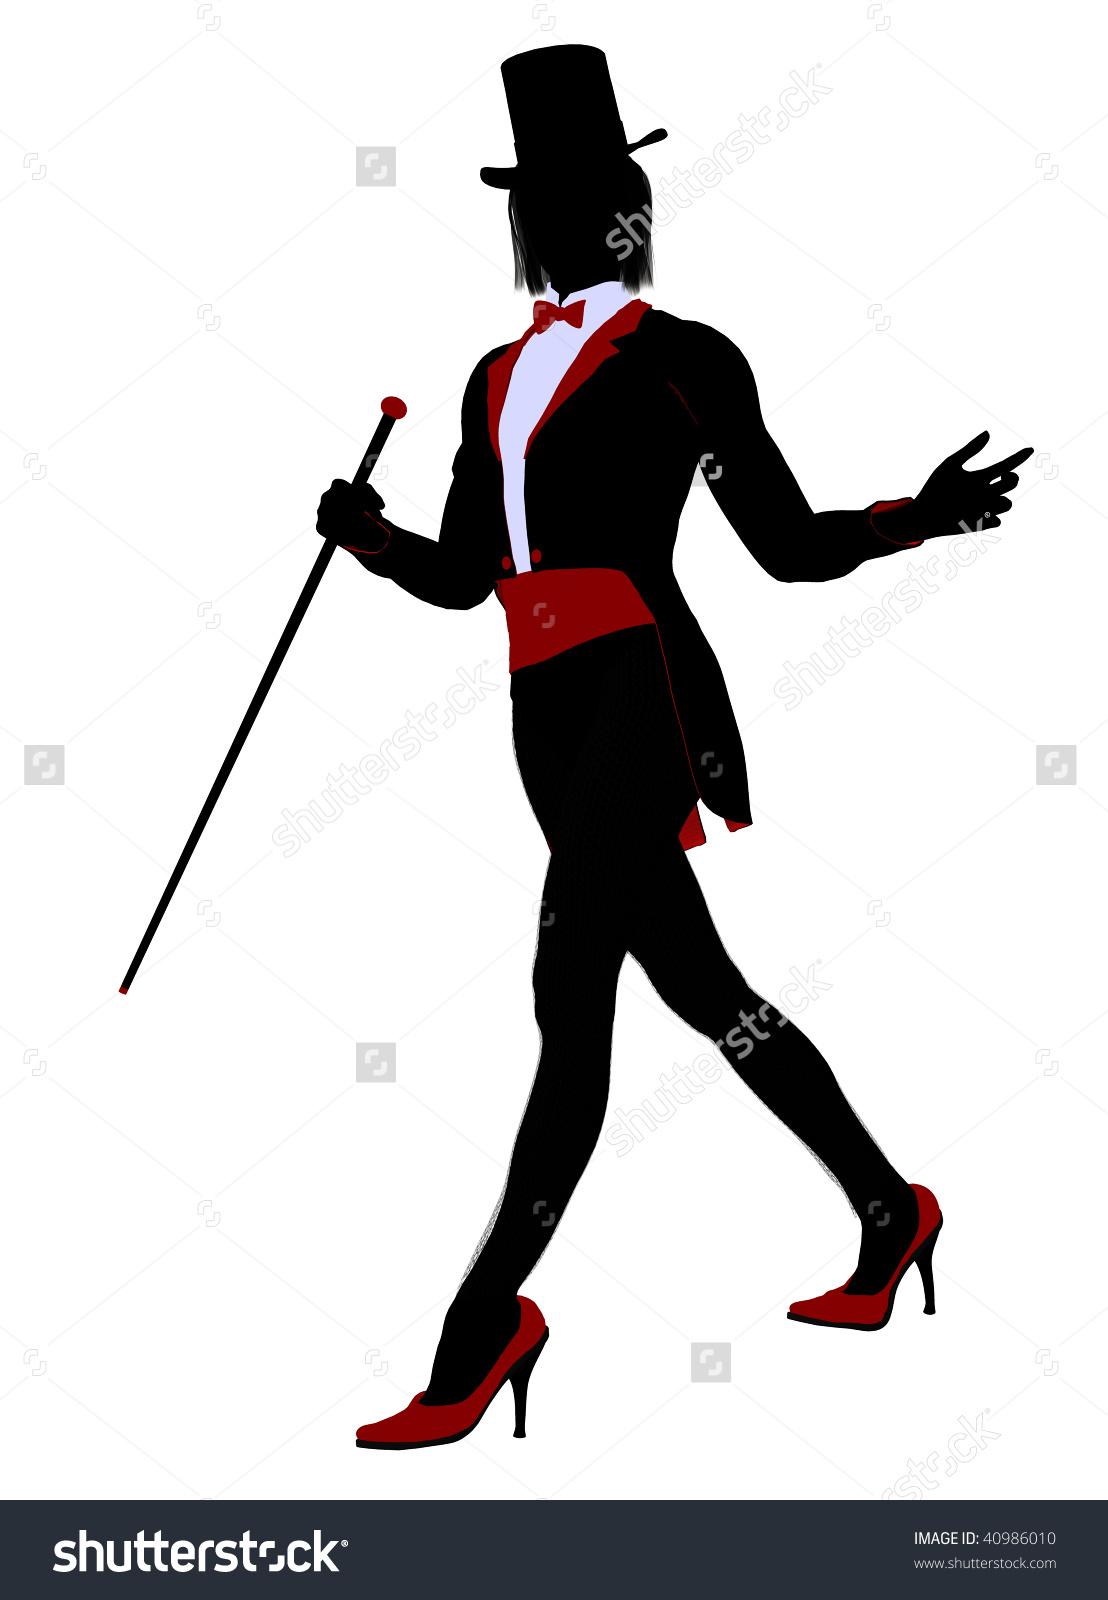 Magician clipart silhouette #6